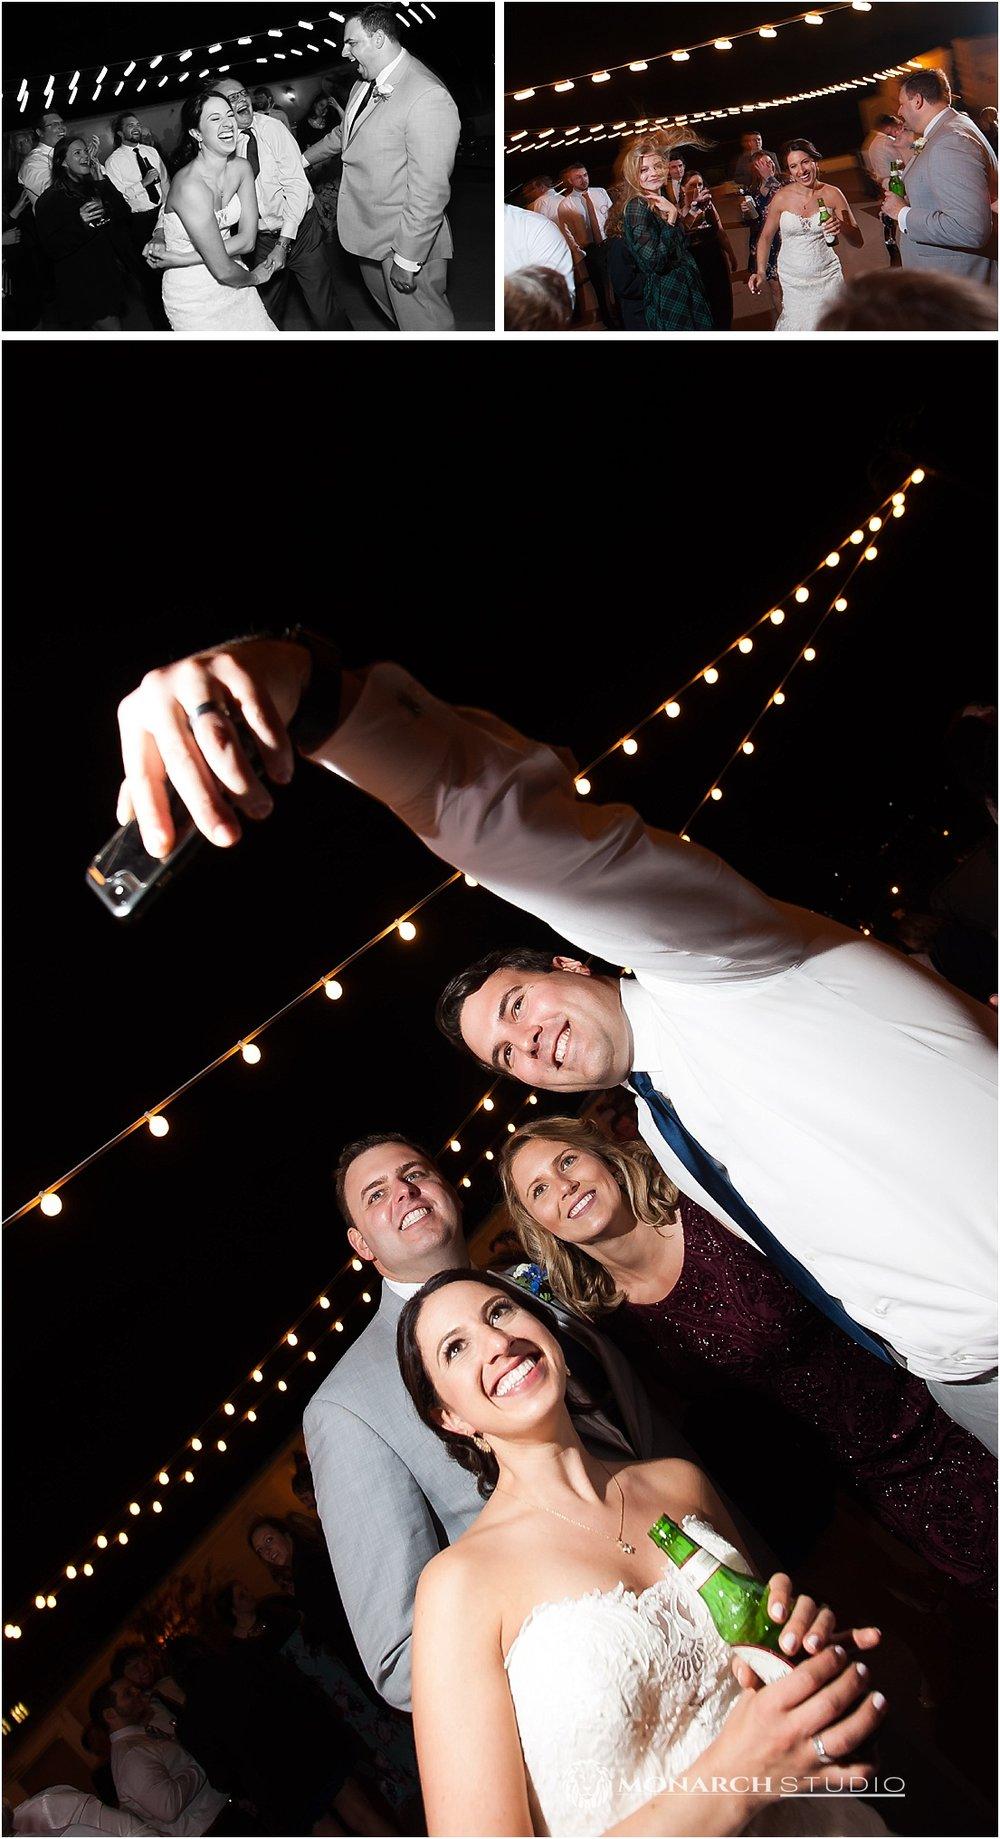 white-room-wedding-photographer-st-augustine-062.jpg